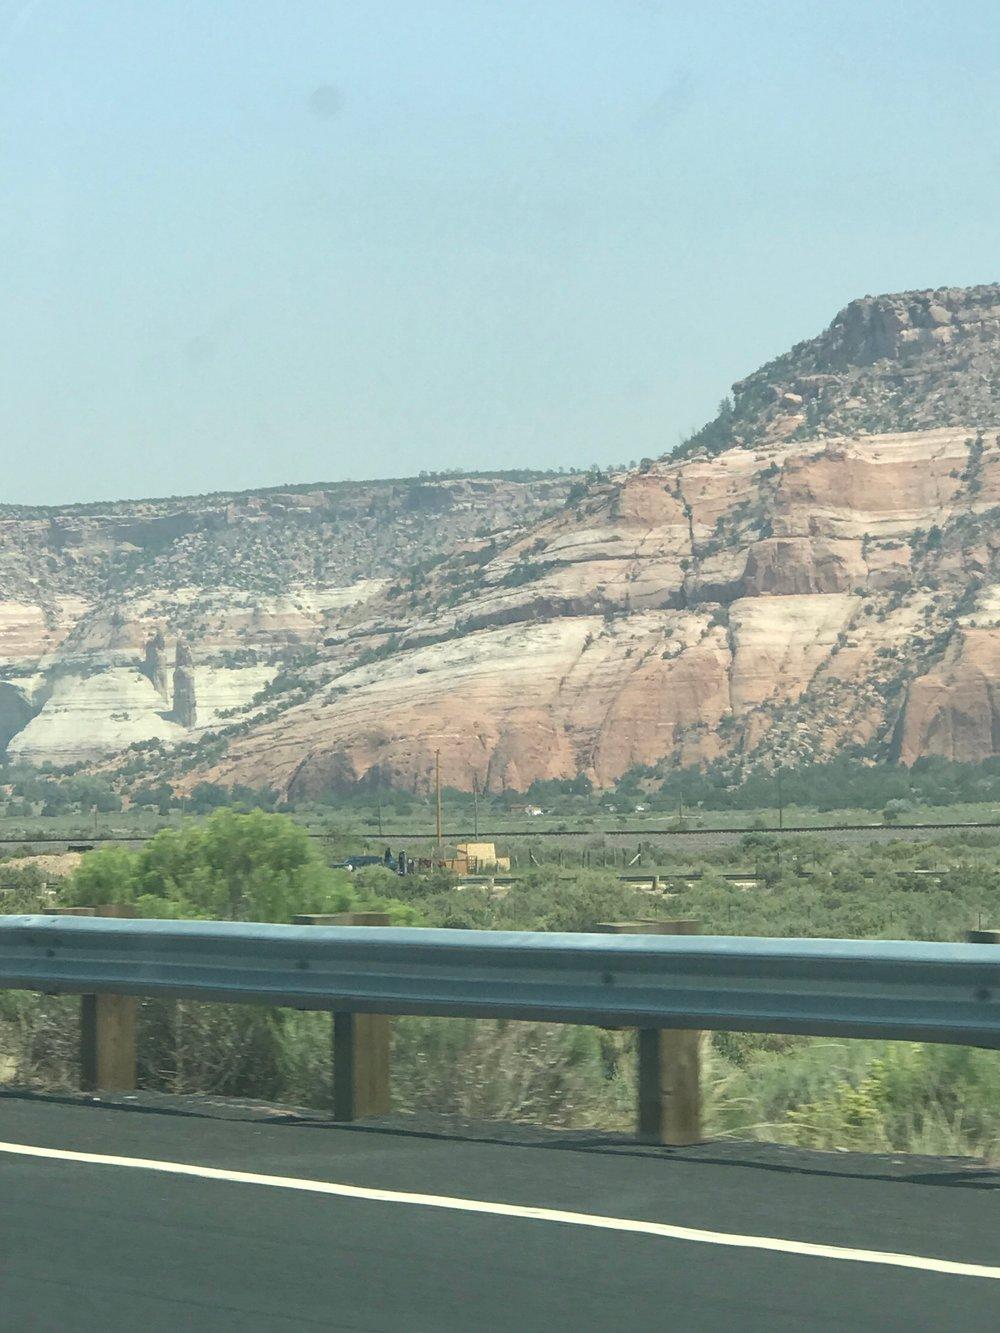 Scenery in Concho, Arizona